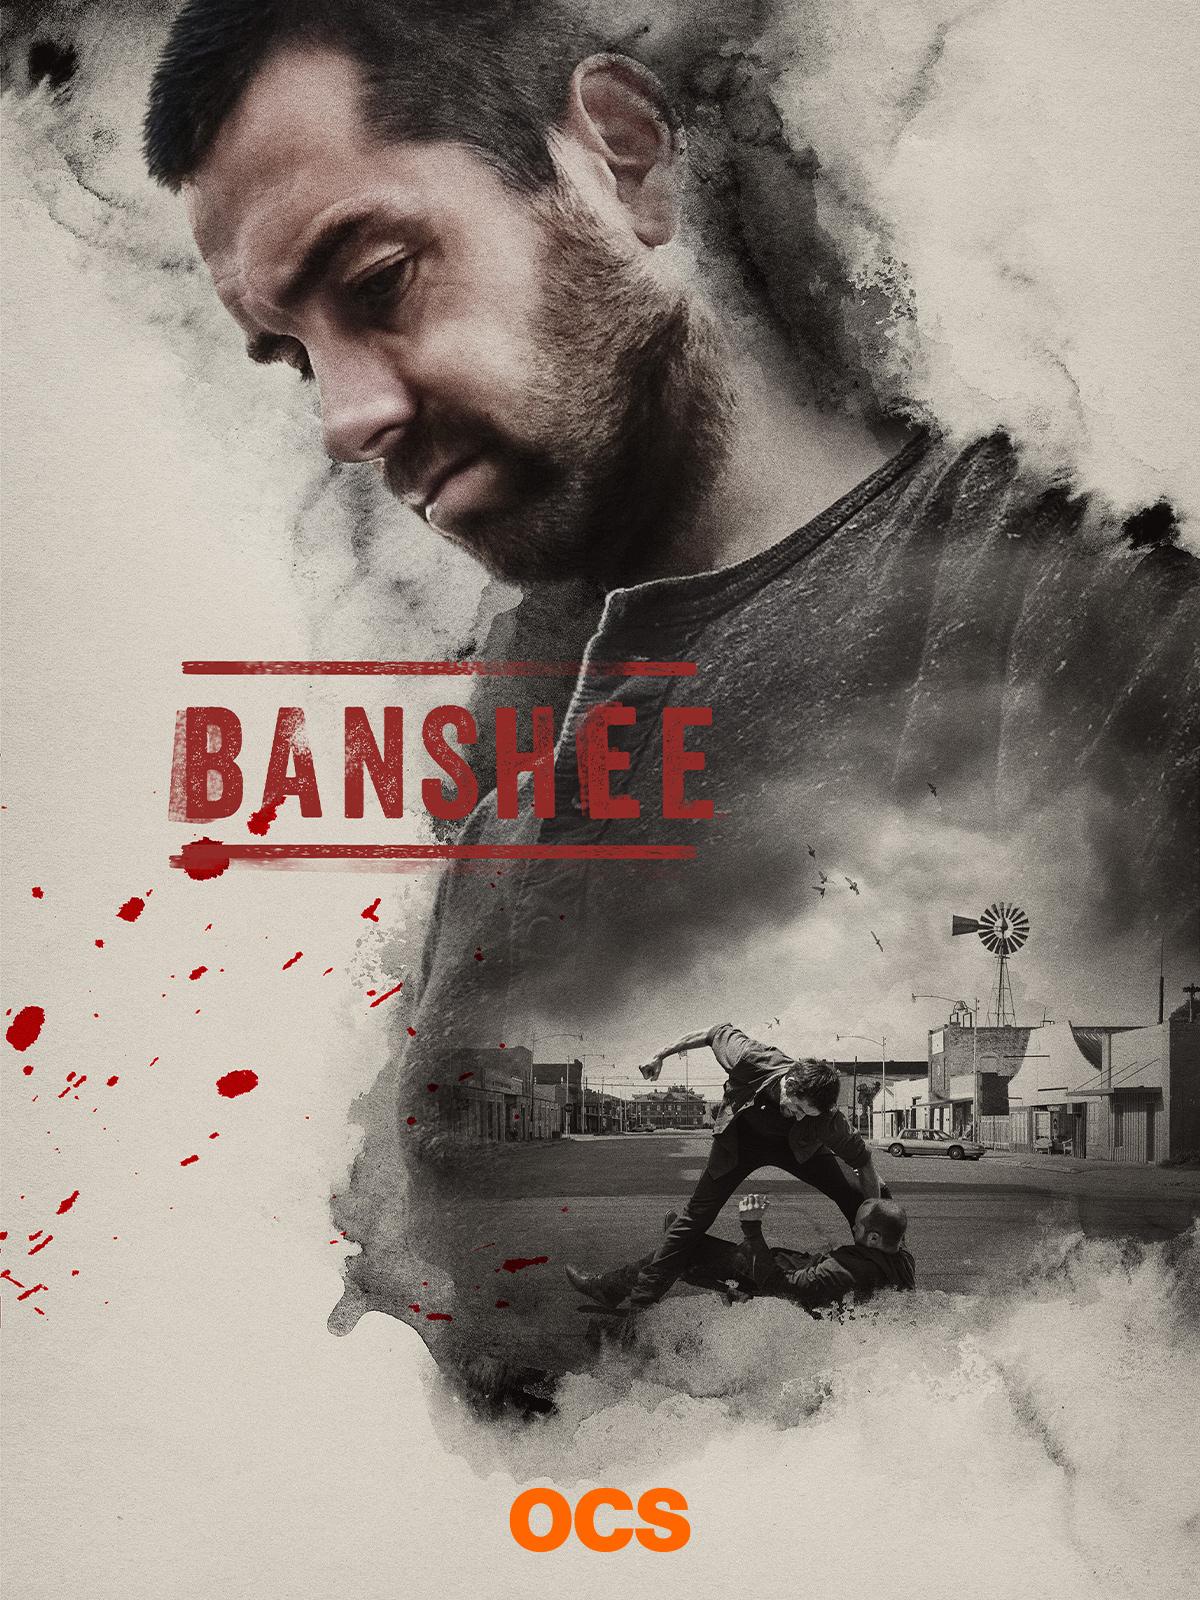 Banshee Saison 1 Streaming Vf : banshee, saison, streaming, Banshee, Saison, AlloCiné